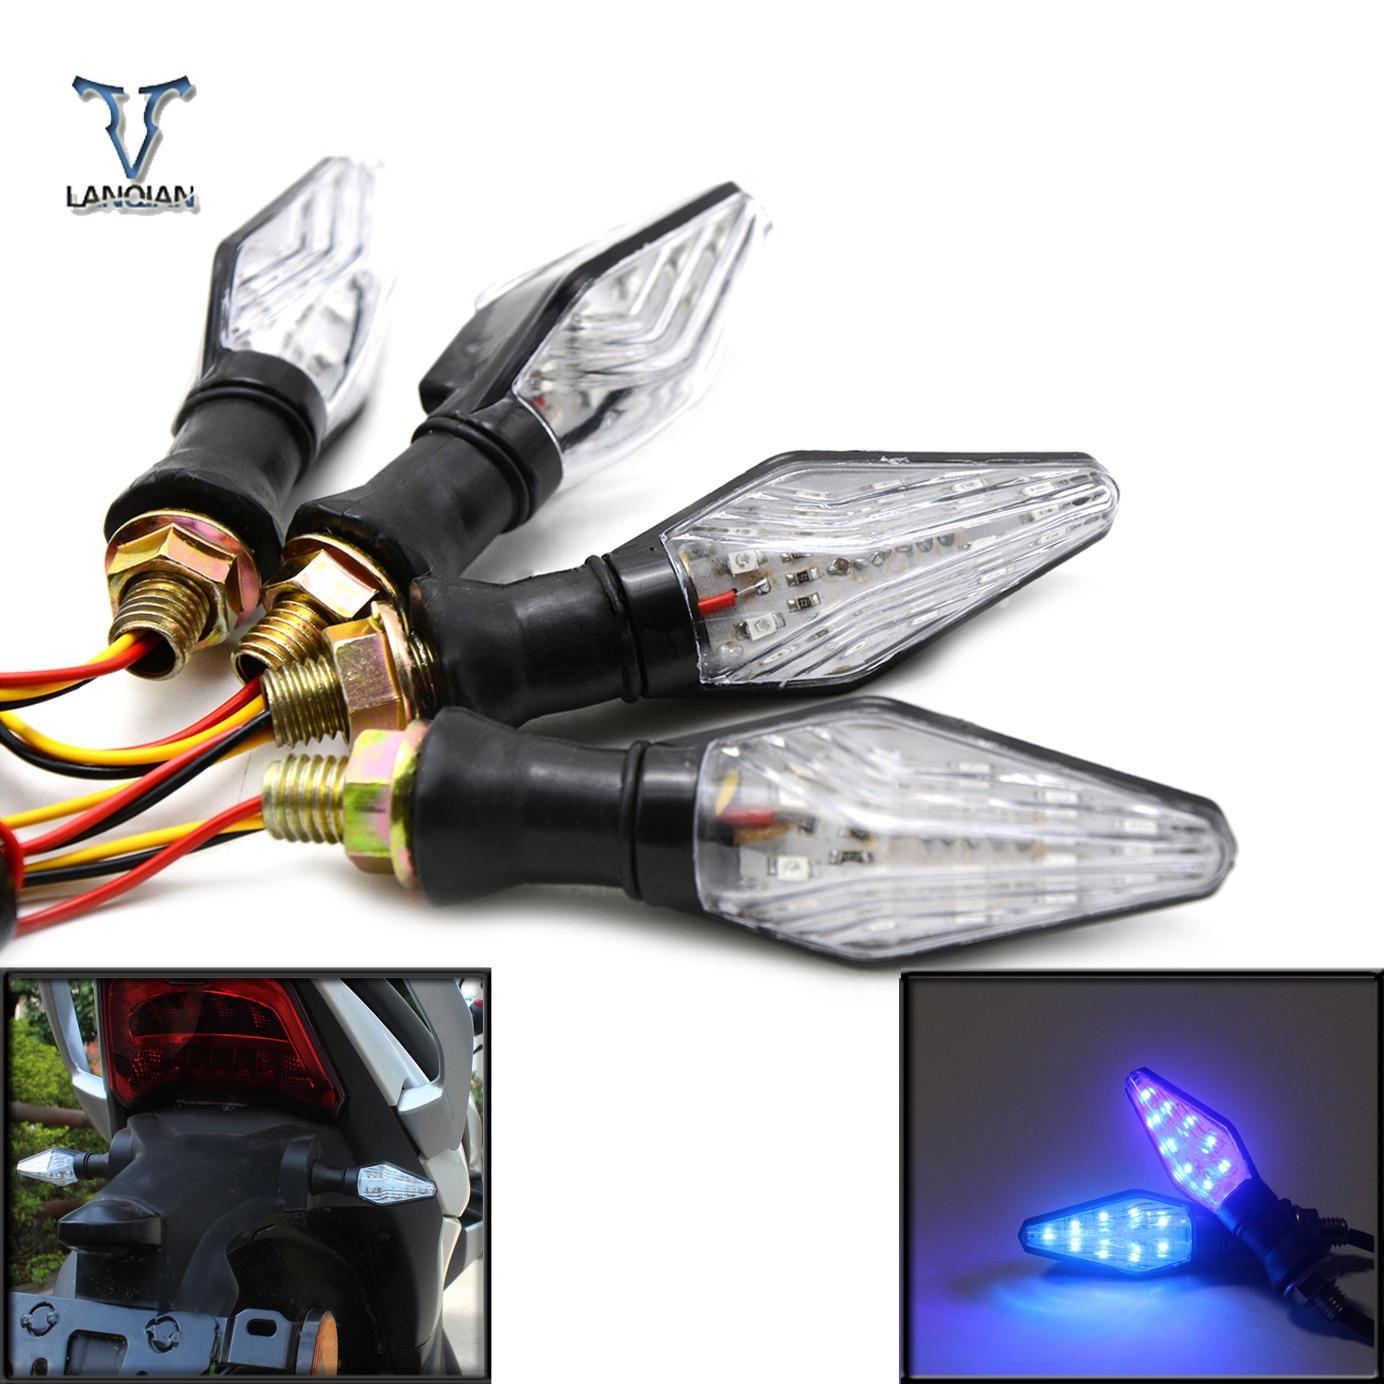 Led Motorcycle turn signals light led lamps sportster for TRIUMPH 675 STREET TRIPLE AMERICA AMERICA/LT BONNEVILLE /SE/T100/Black